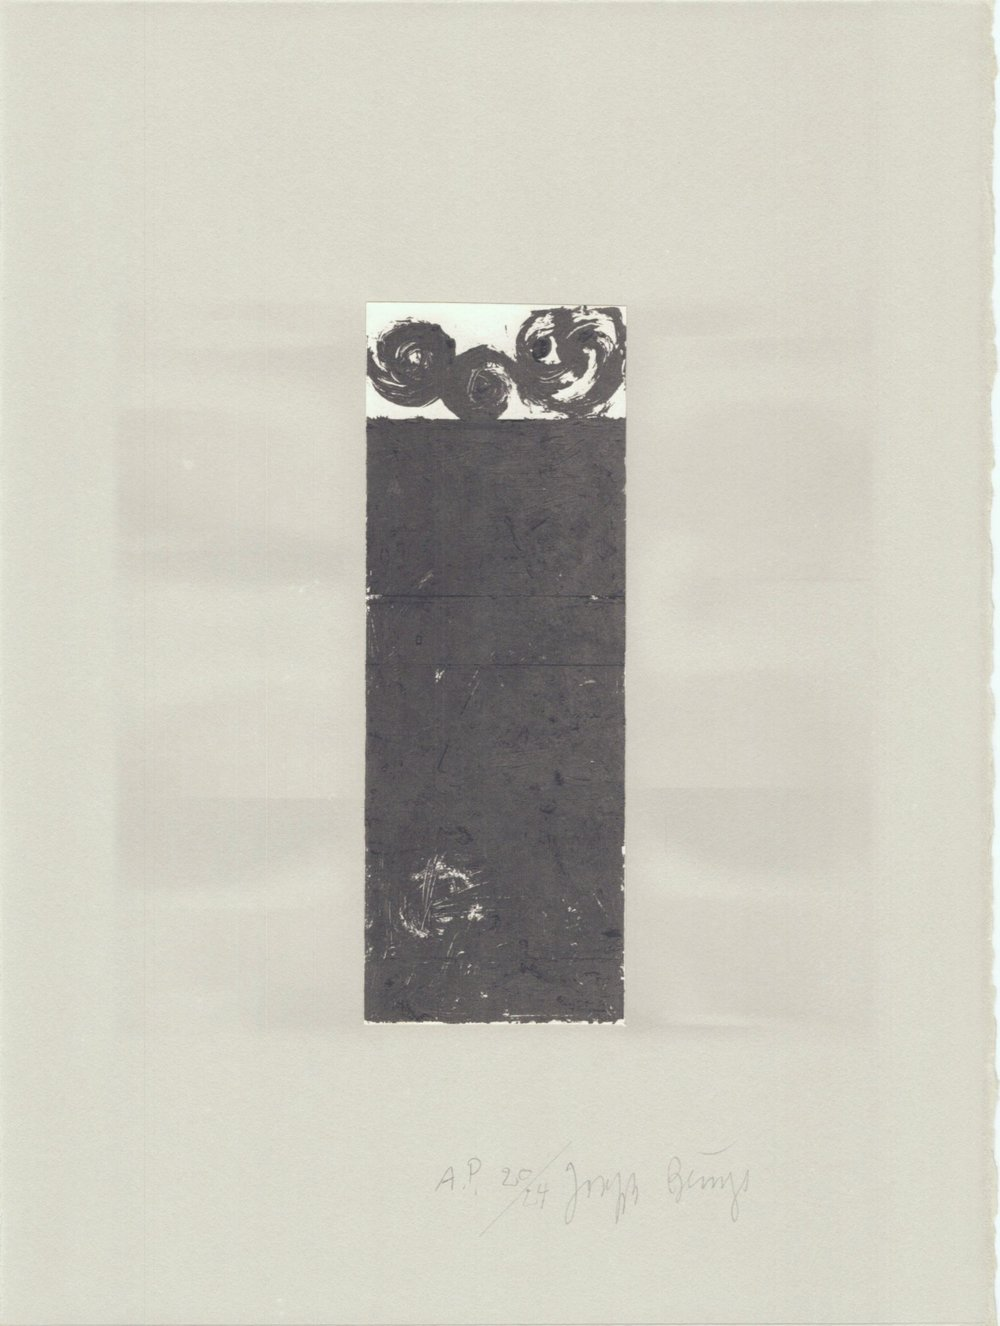 Schwurhand-Scrolls 71/75 (Normalausgabe, Lithographie auf Rives gris) 1980